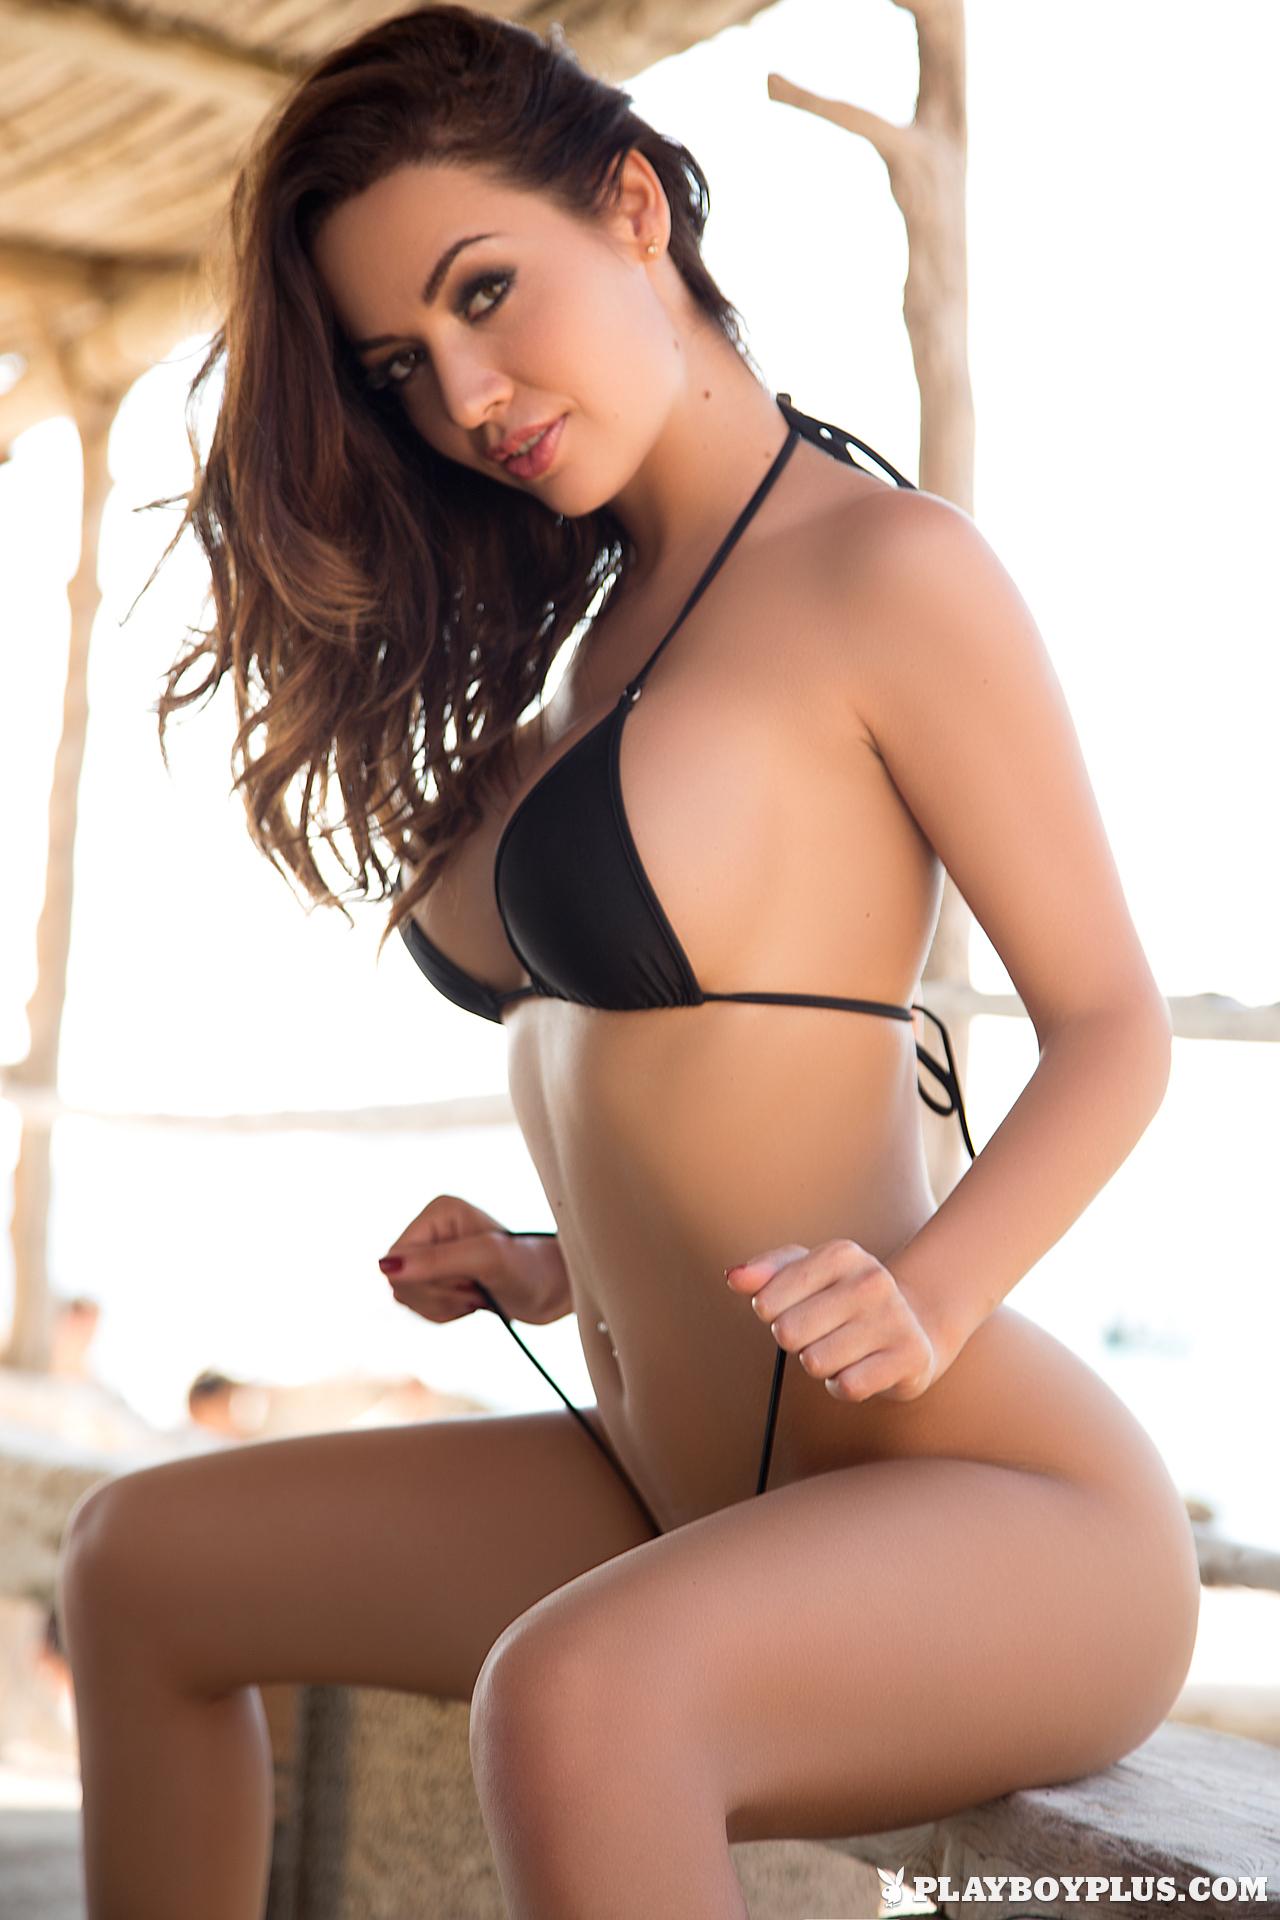 carly having sex naked